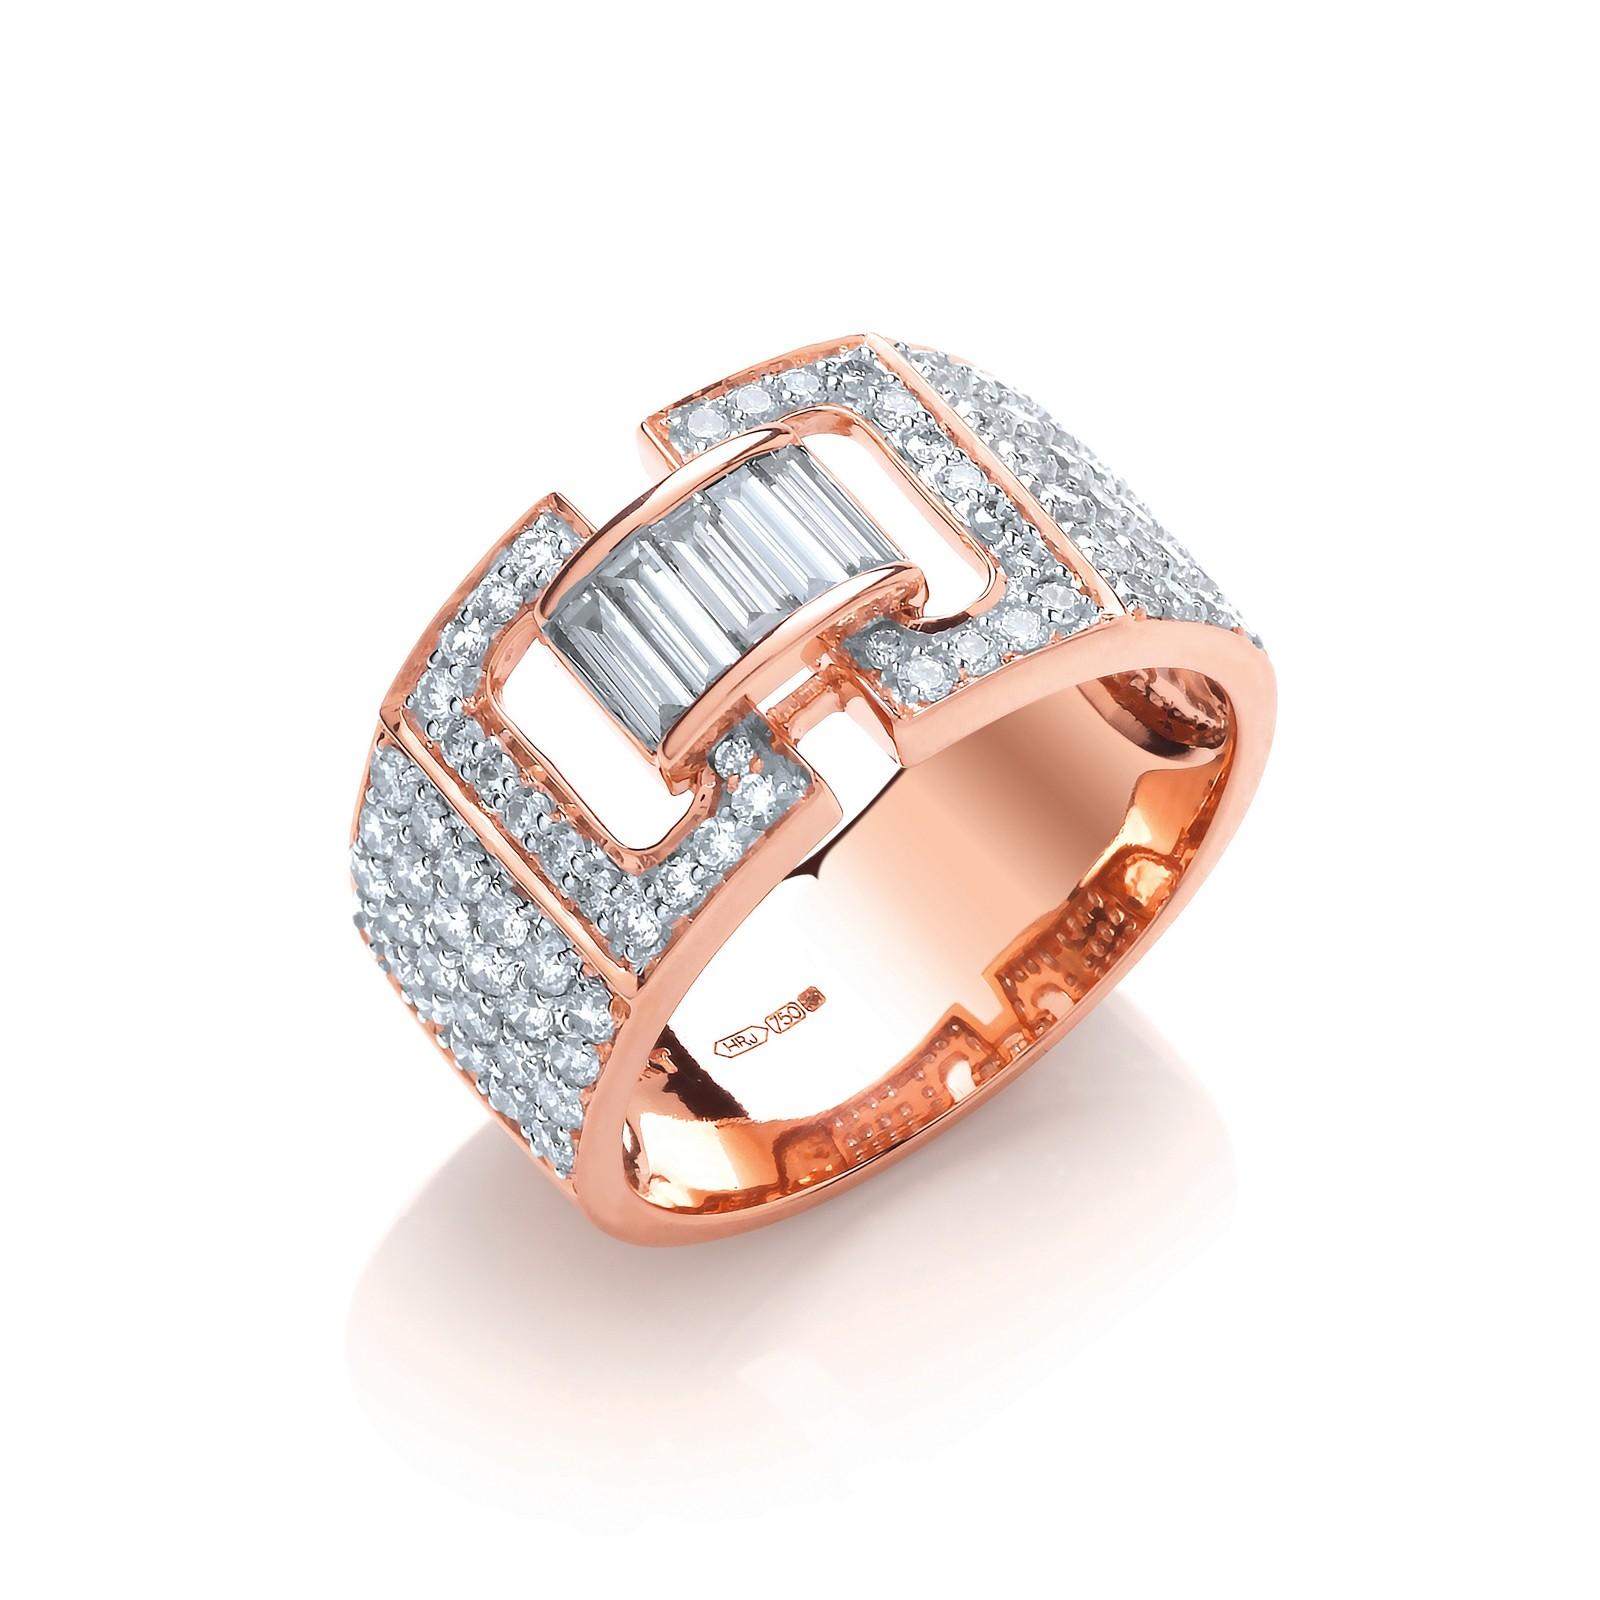 18ct Rose Gold 1.15ctw Diamond Ring